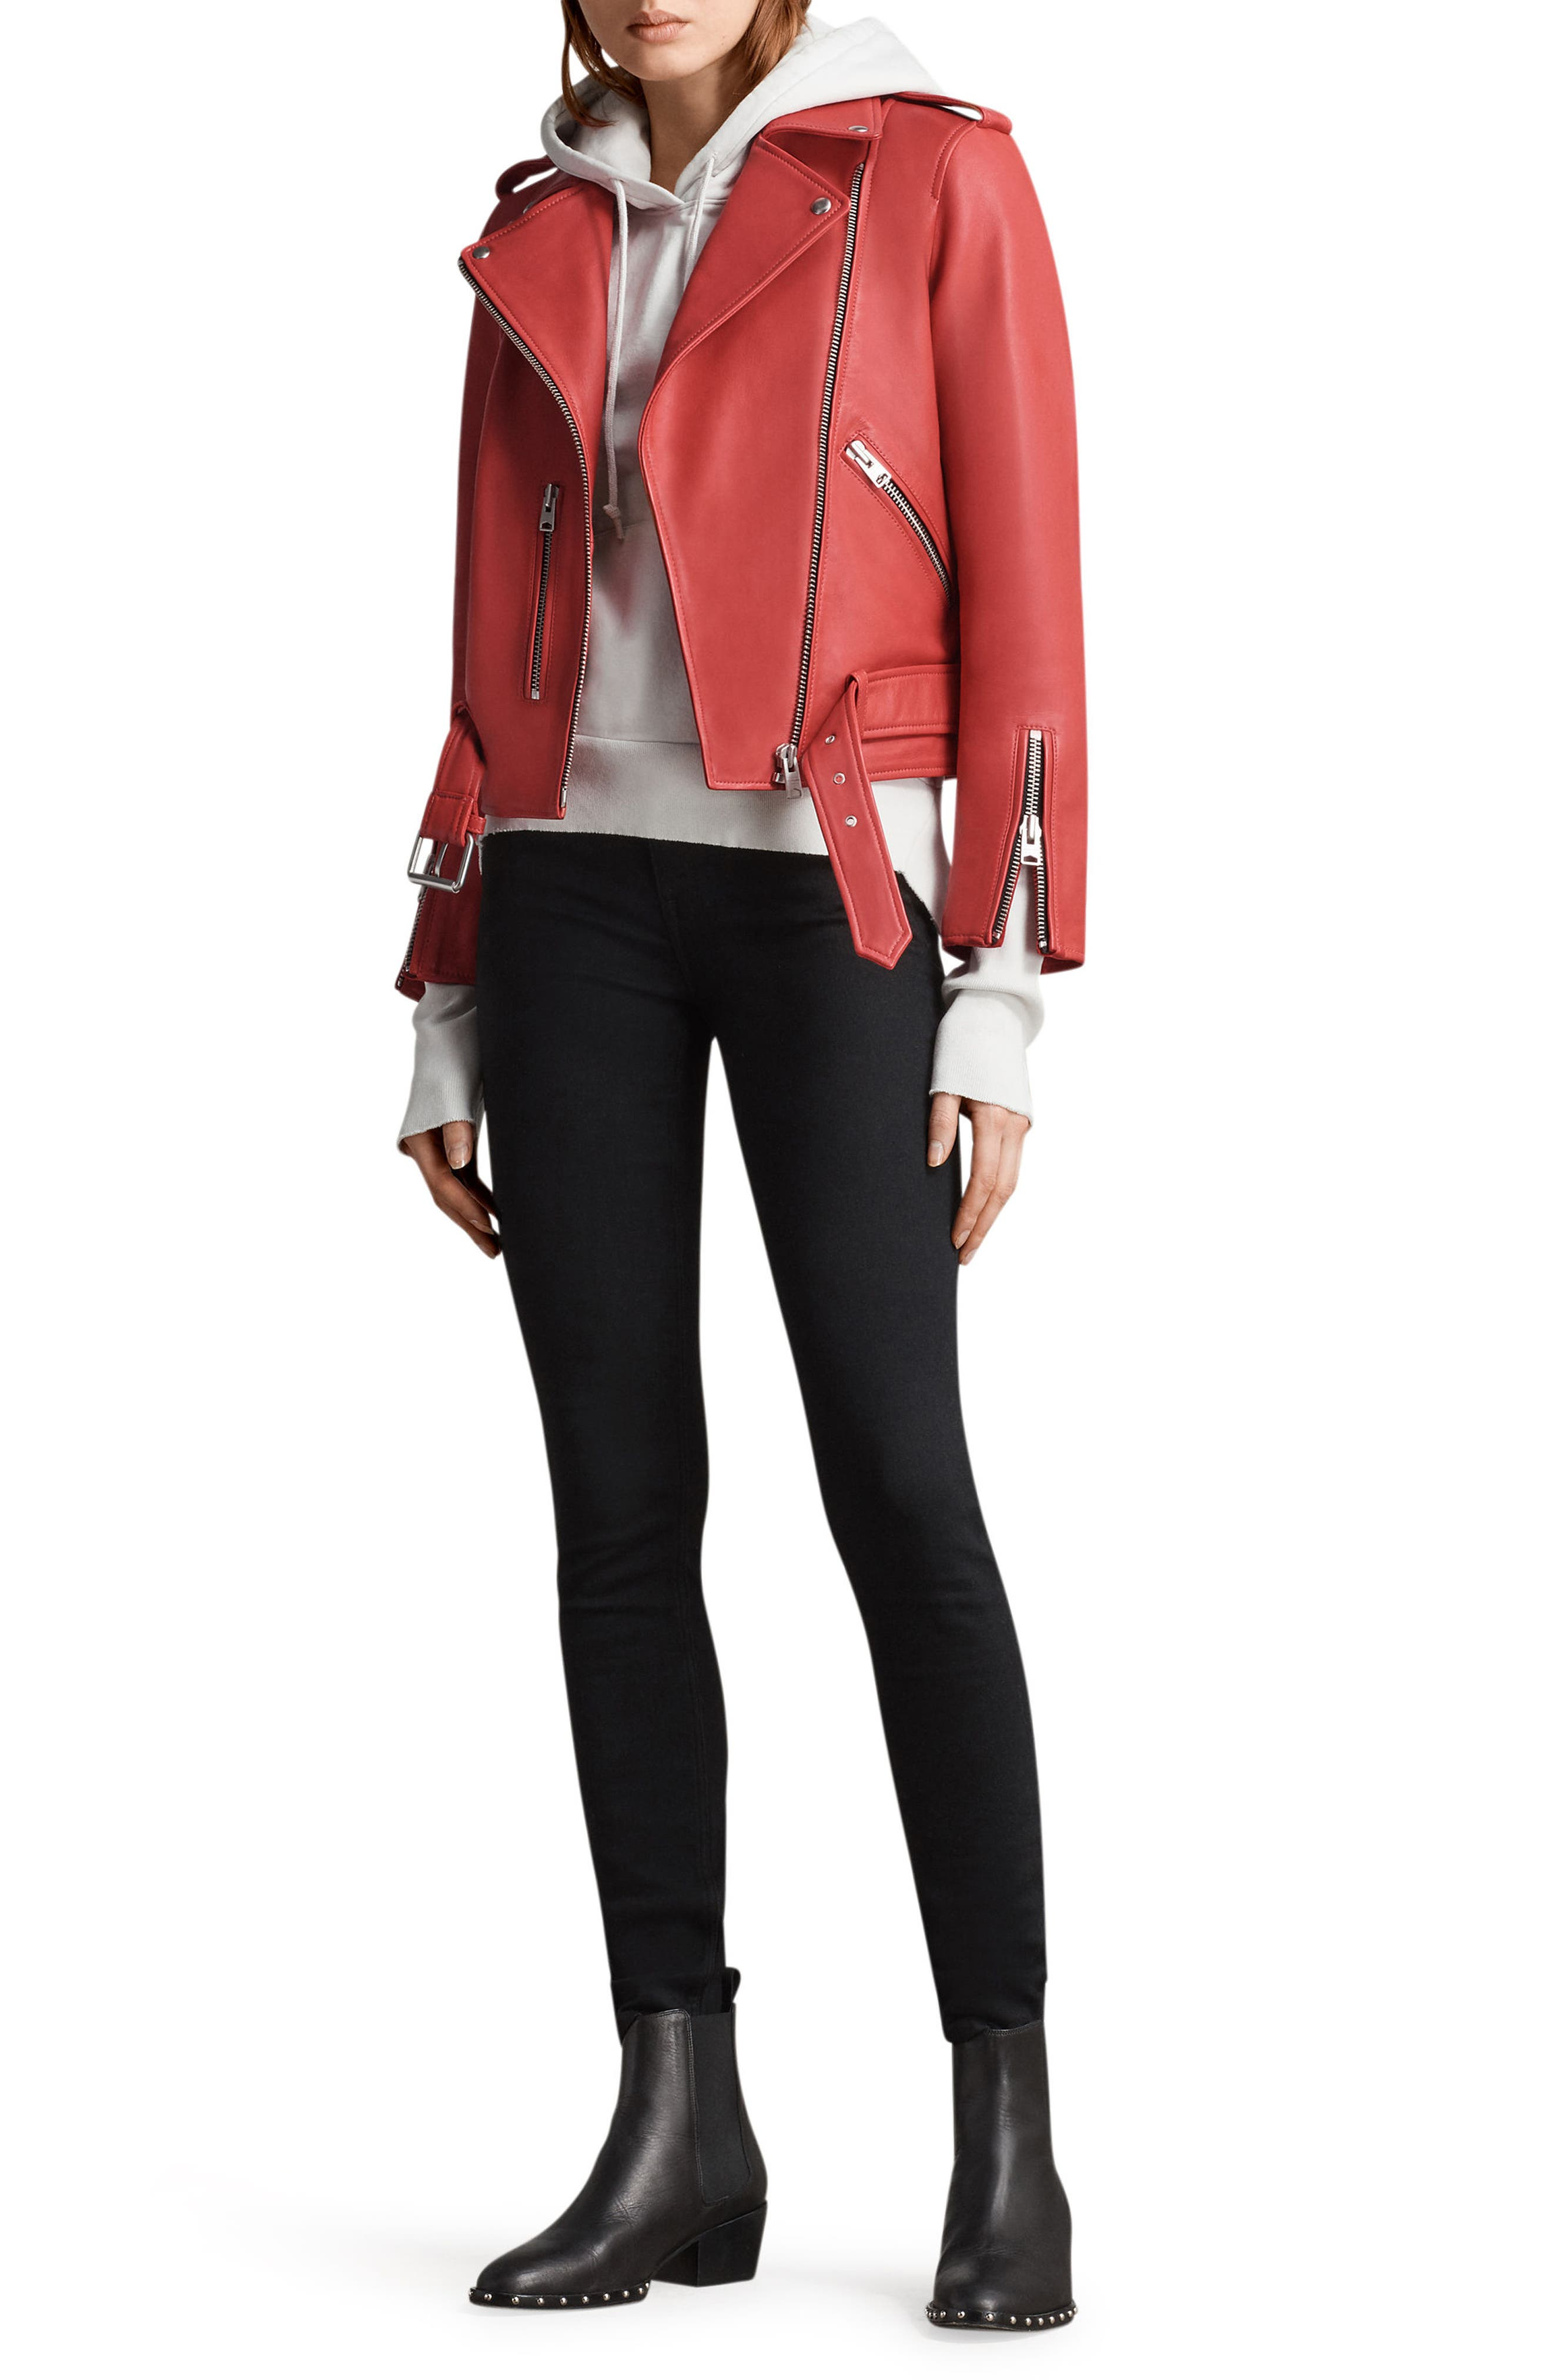 Balfern Leather Biker Jacket,                             Alternate thumbnail 2, color,                             Coral Red